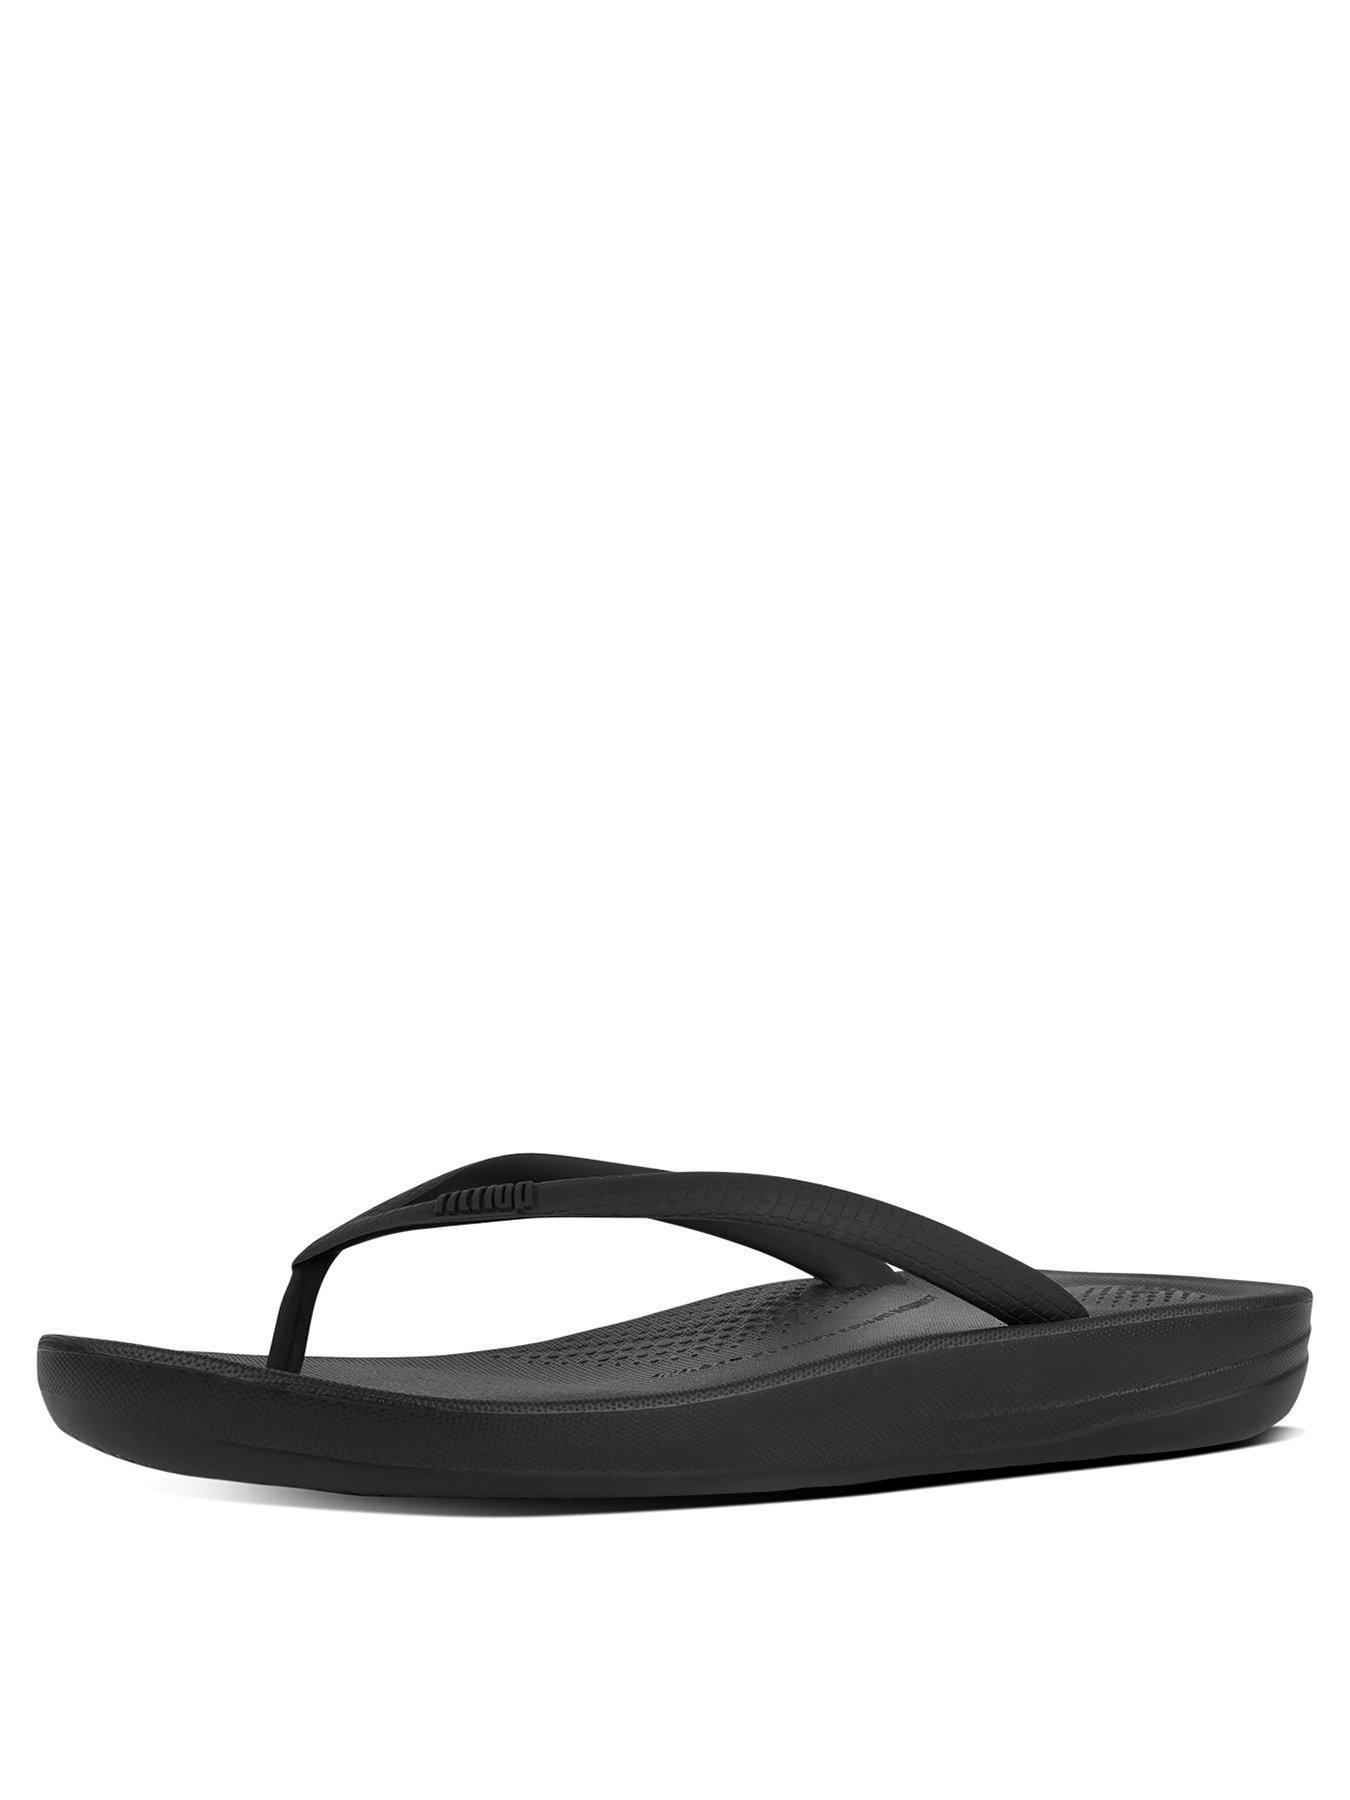 Fitflop   Sandals \u0026 flip flops   Shoes